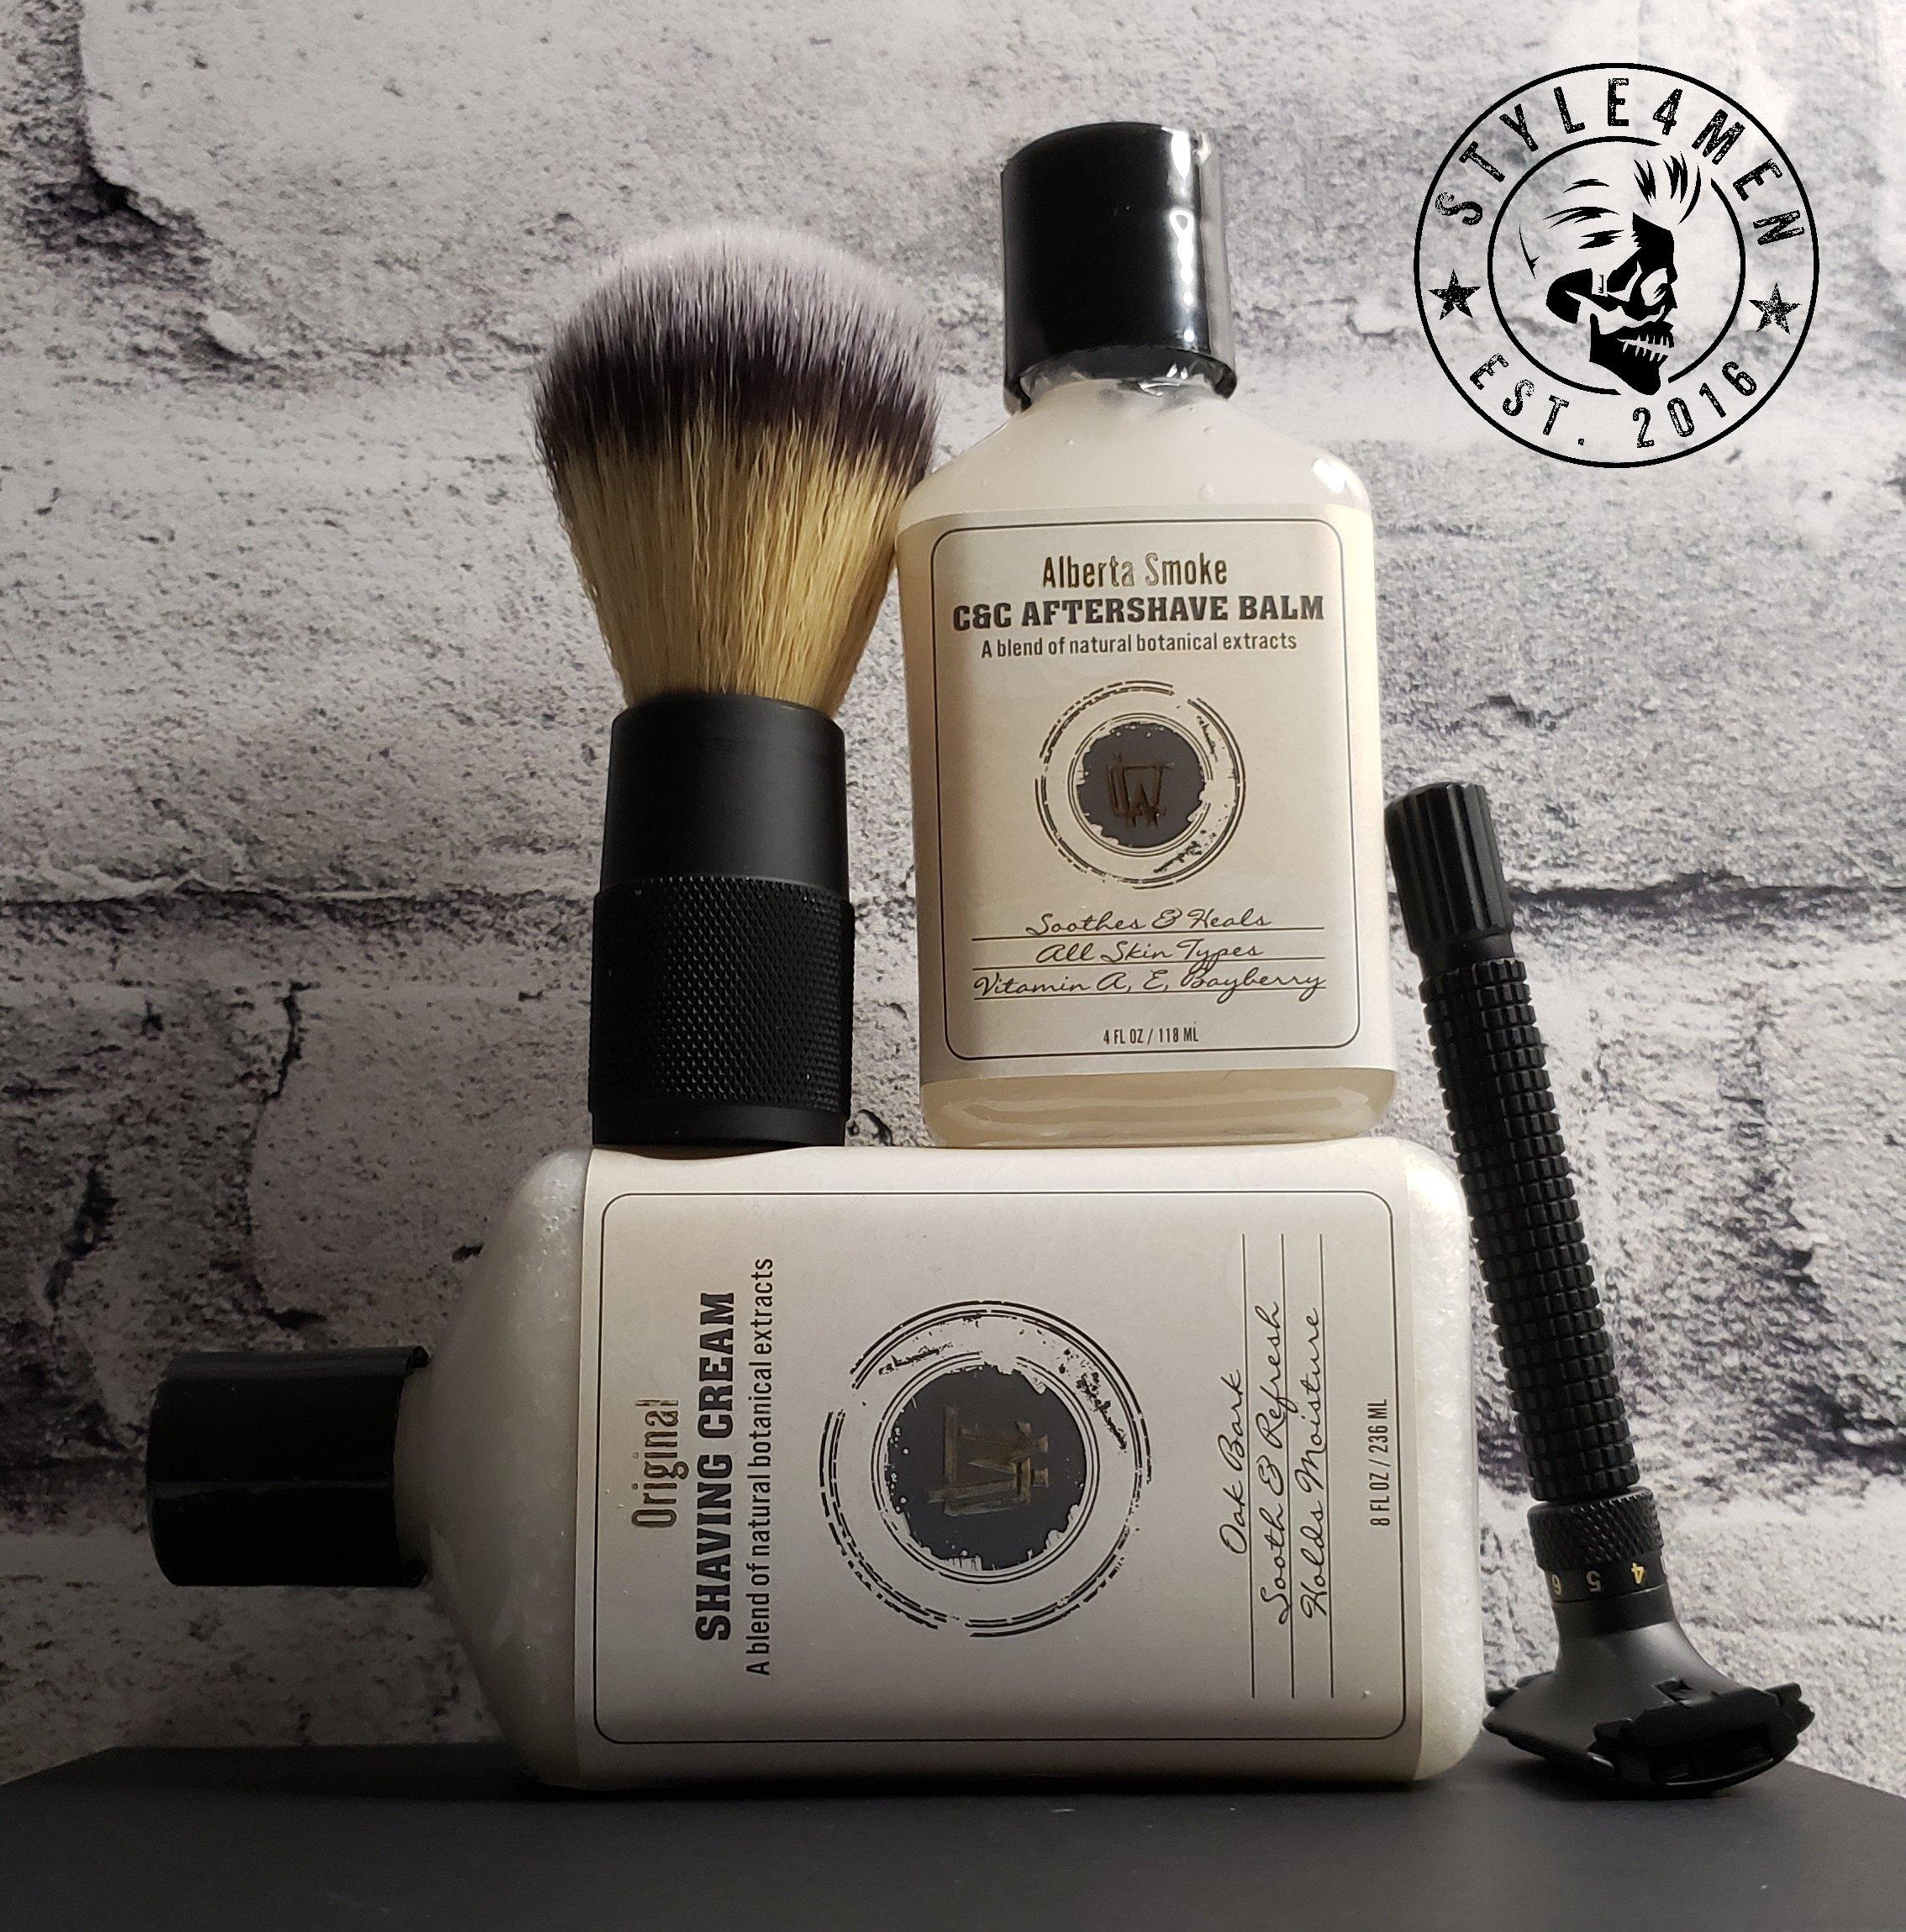 The Alberta Smoke Shave Kit by Chin-Whiskey